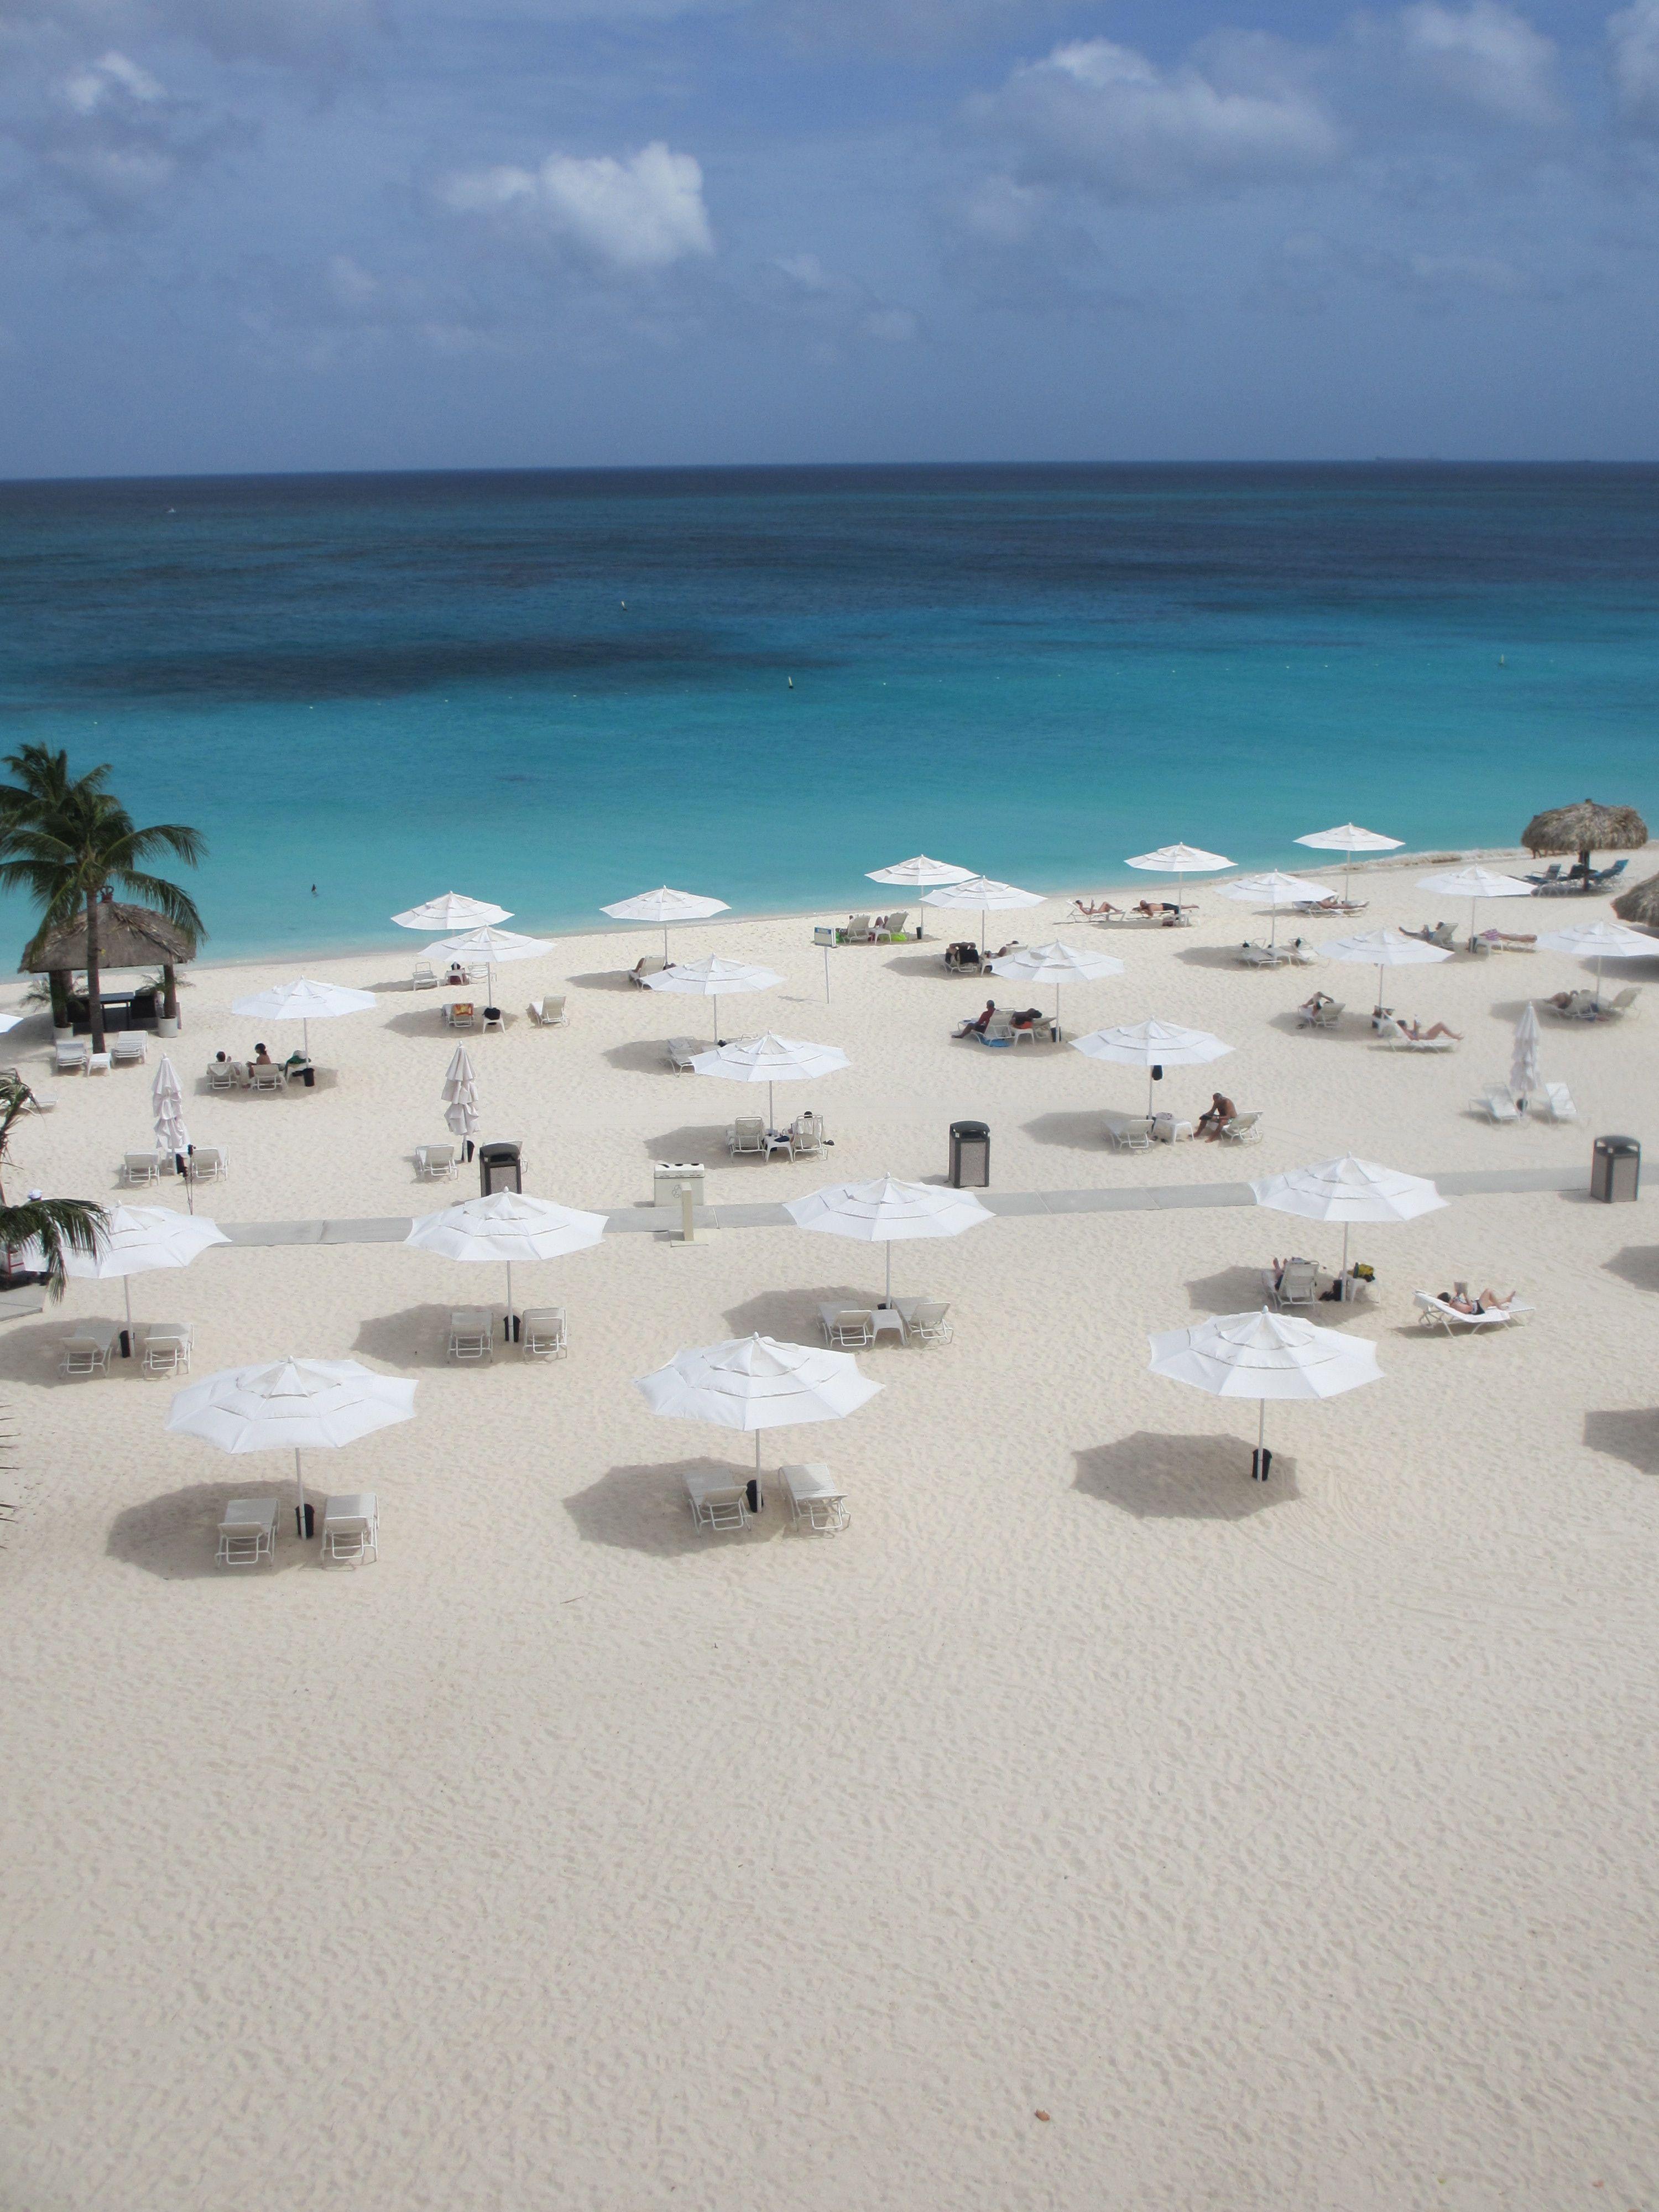 Bucuti u0026 Tara Beach Resort - Aruba uses our 9ft Riva Umbrella with a double vented canopy for better wind circulation. Tese umbrellas have been fighting ... & Bucuti u0026 Tara Beach Resort - Aruba uses our 9ft Riva Umbrella ...